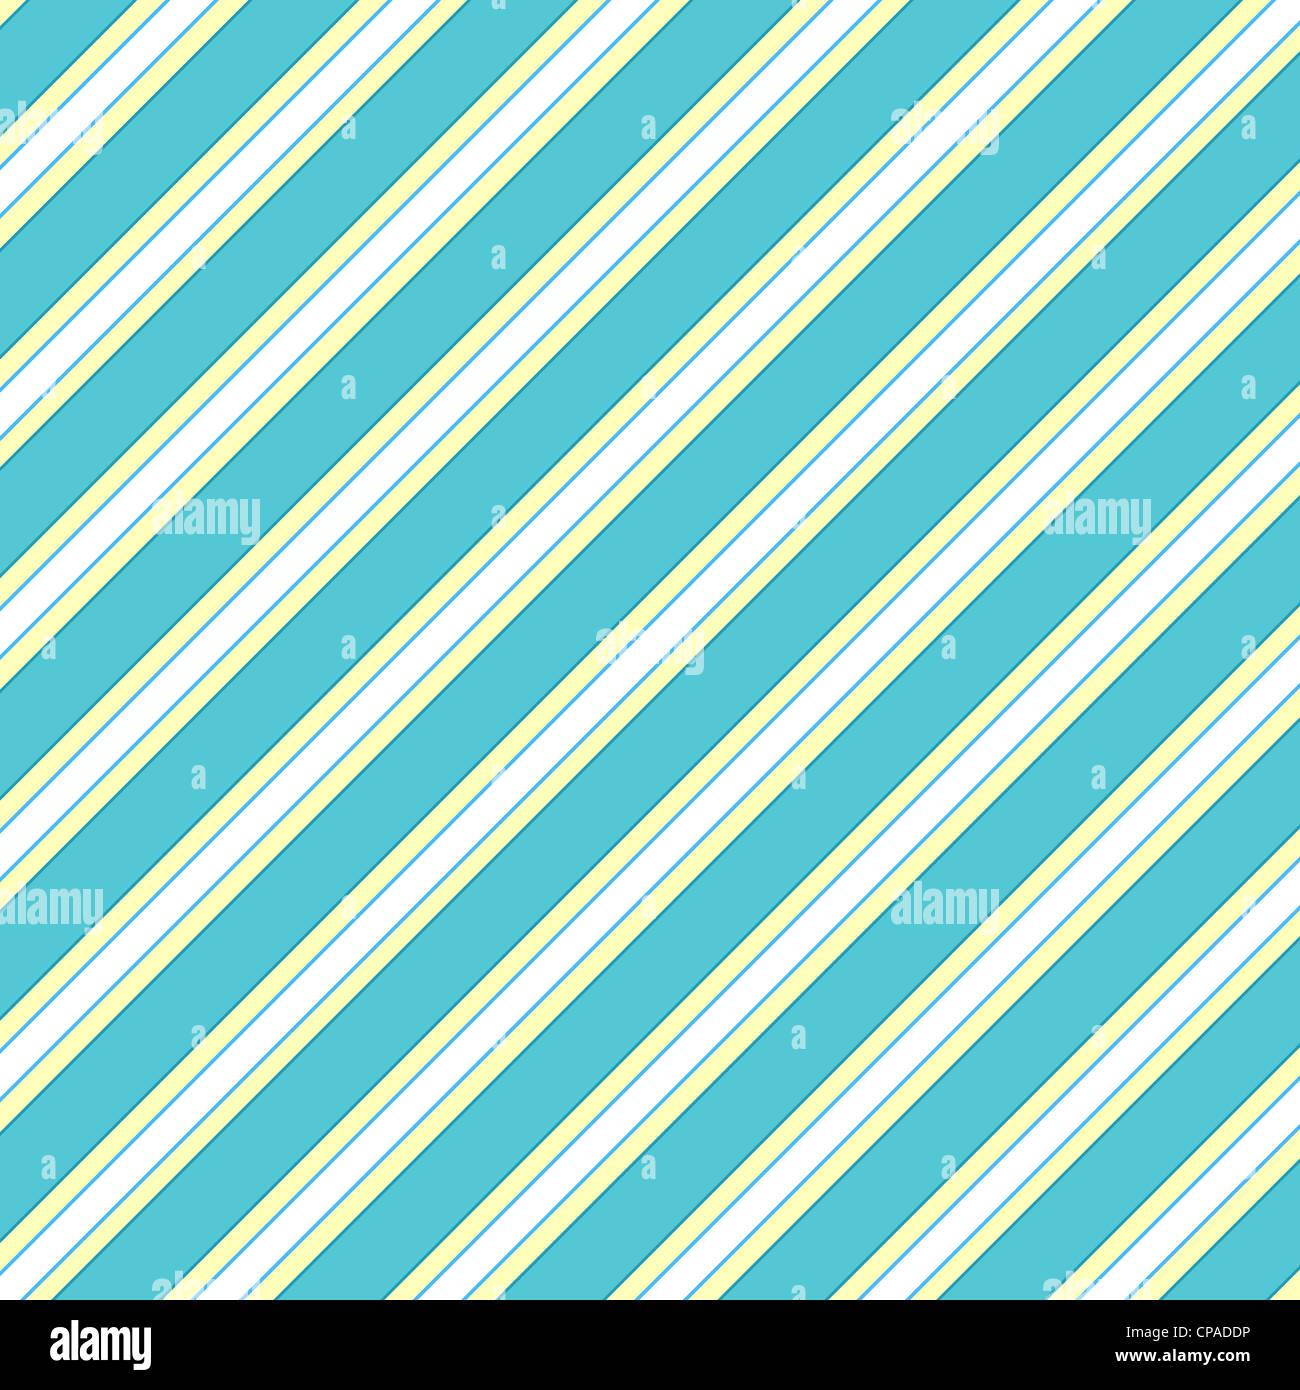 Diagonal stripes pattern in blue, white and yellow Stock Photo